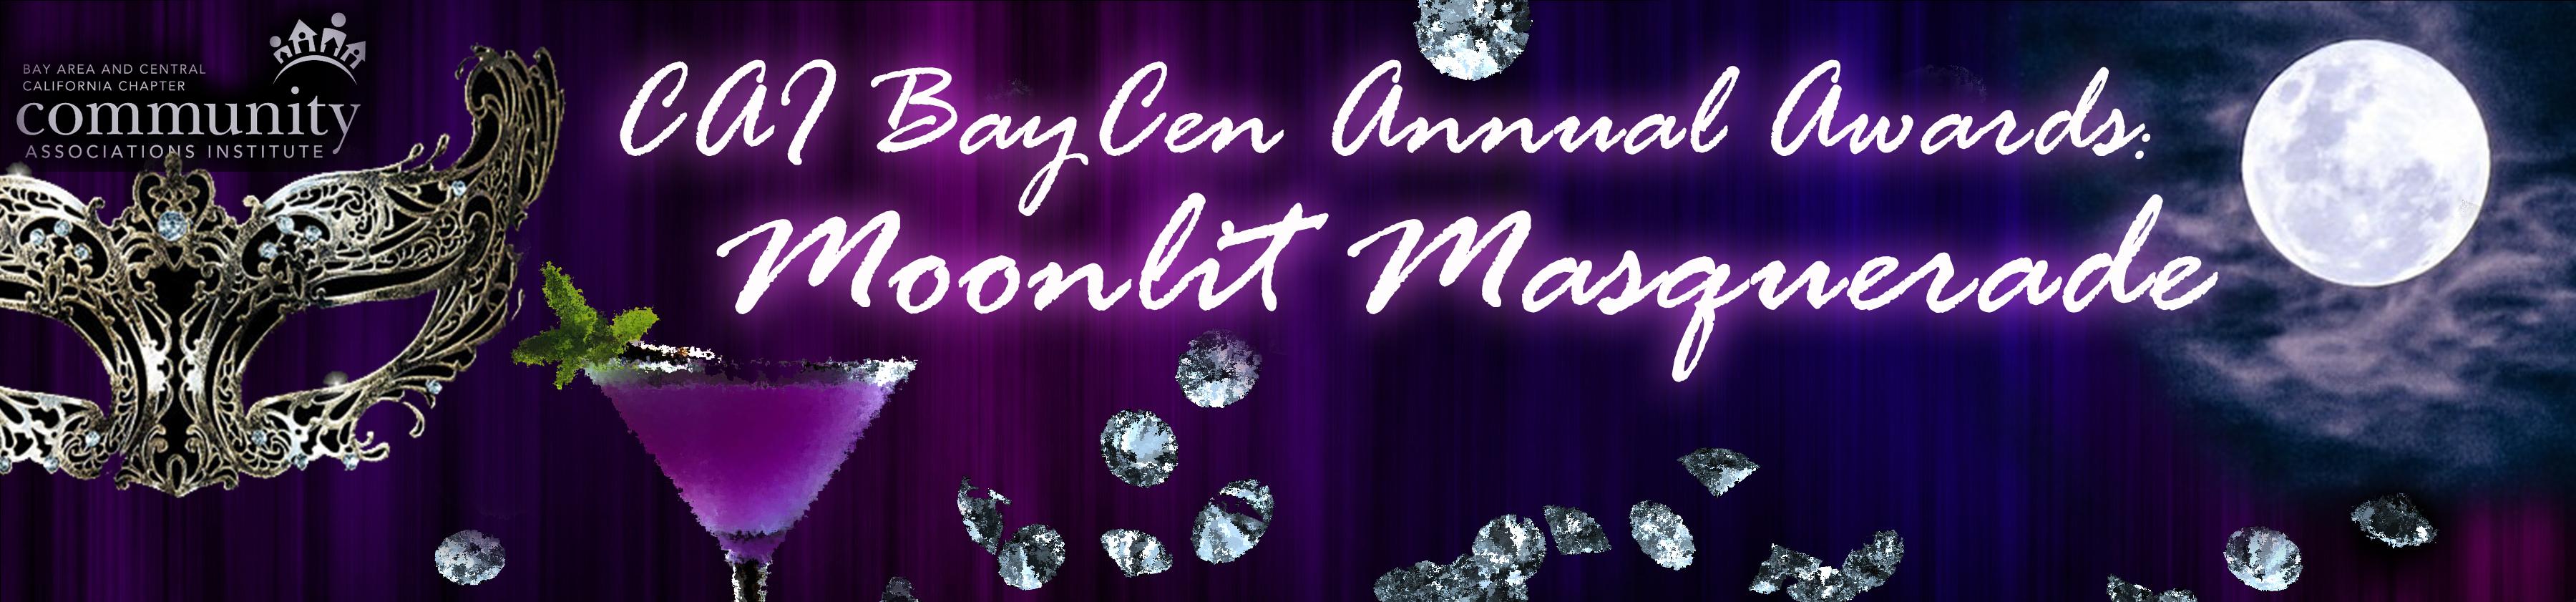 CAI BayCen <BR> Annual Awards  - Moonlit Masquerade <BR> 12/02/16